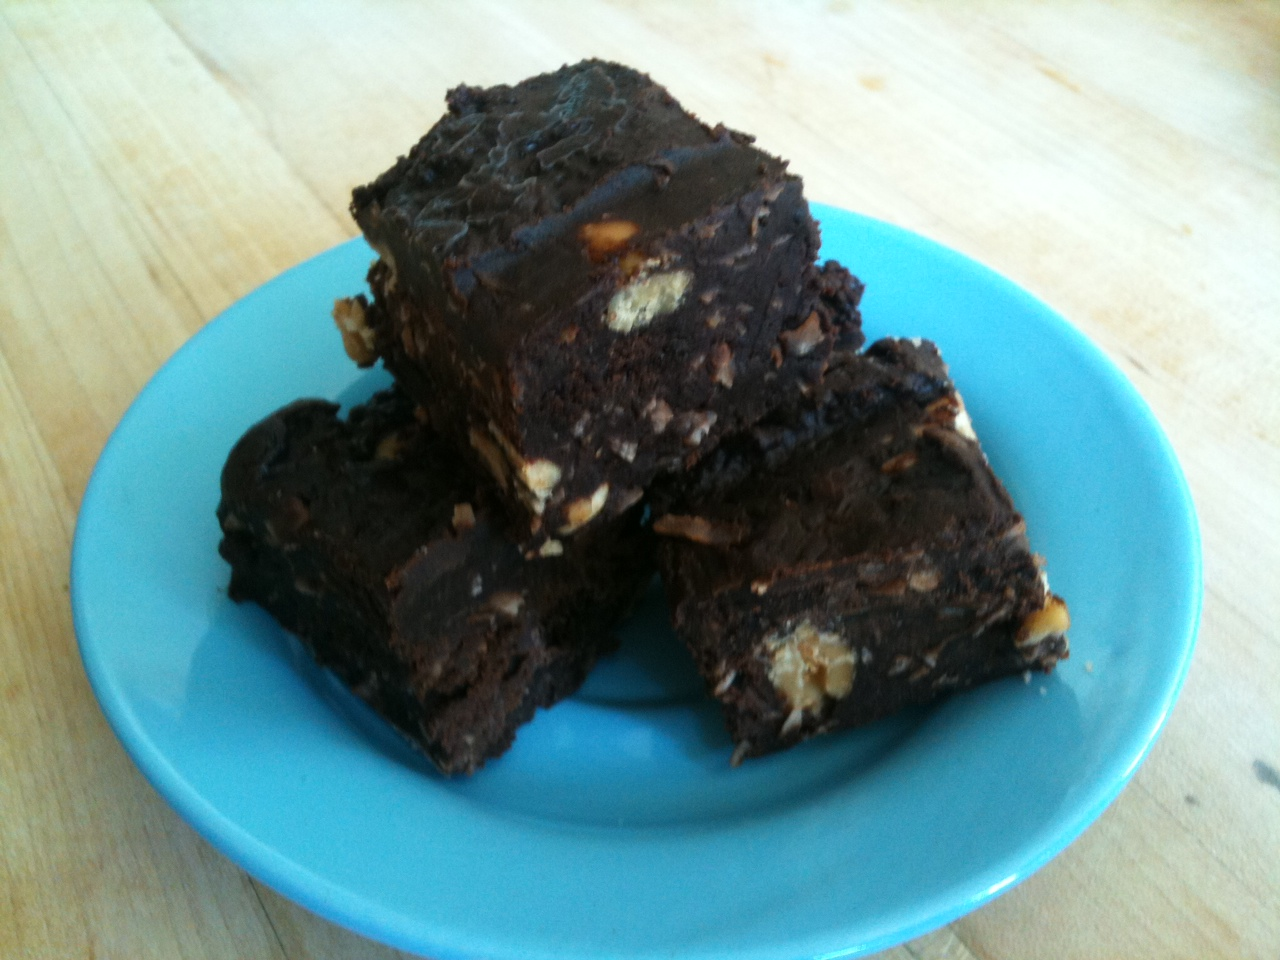 Super-decadent No-Bake Fudge Brownies